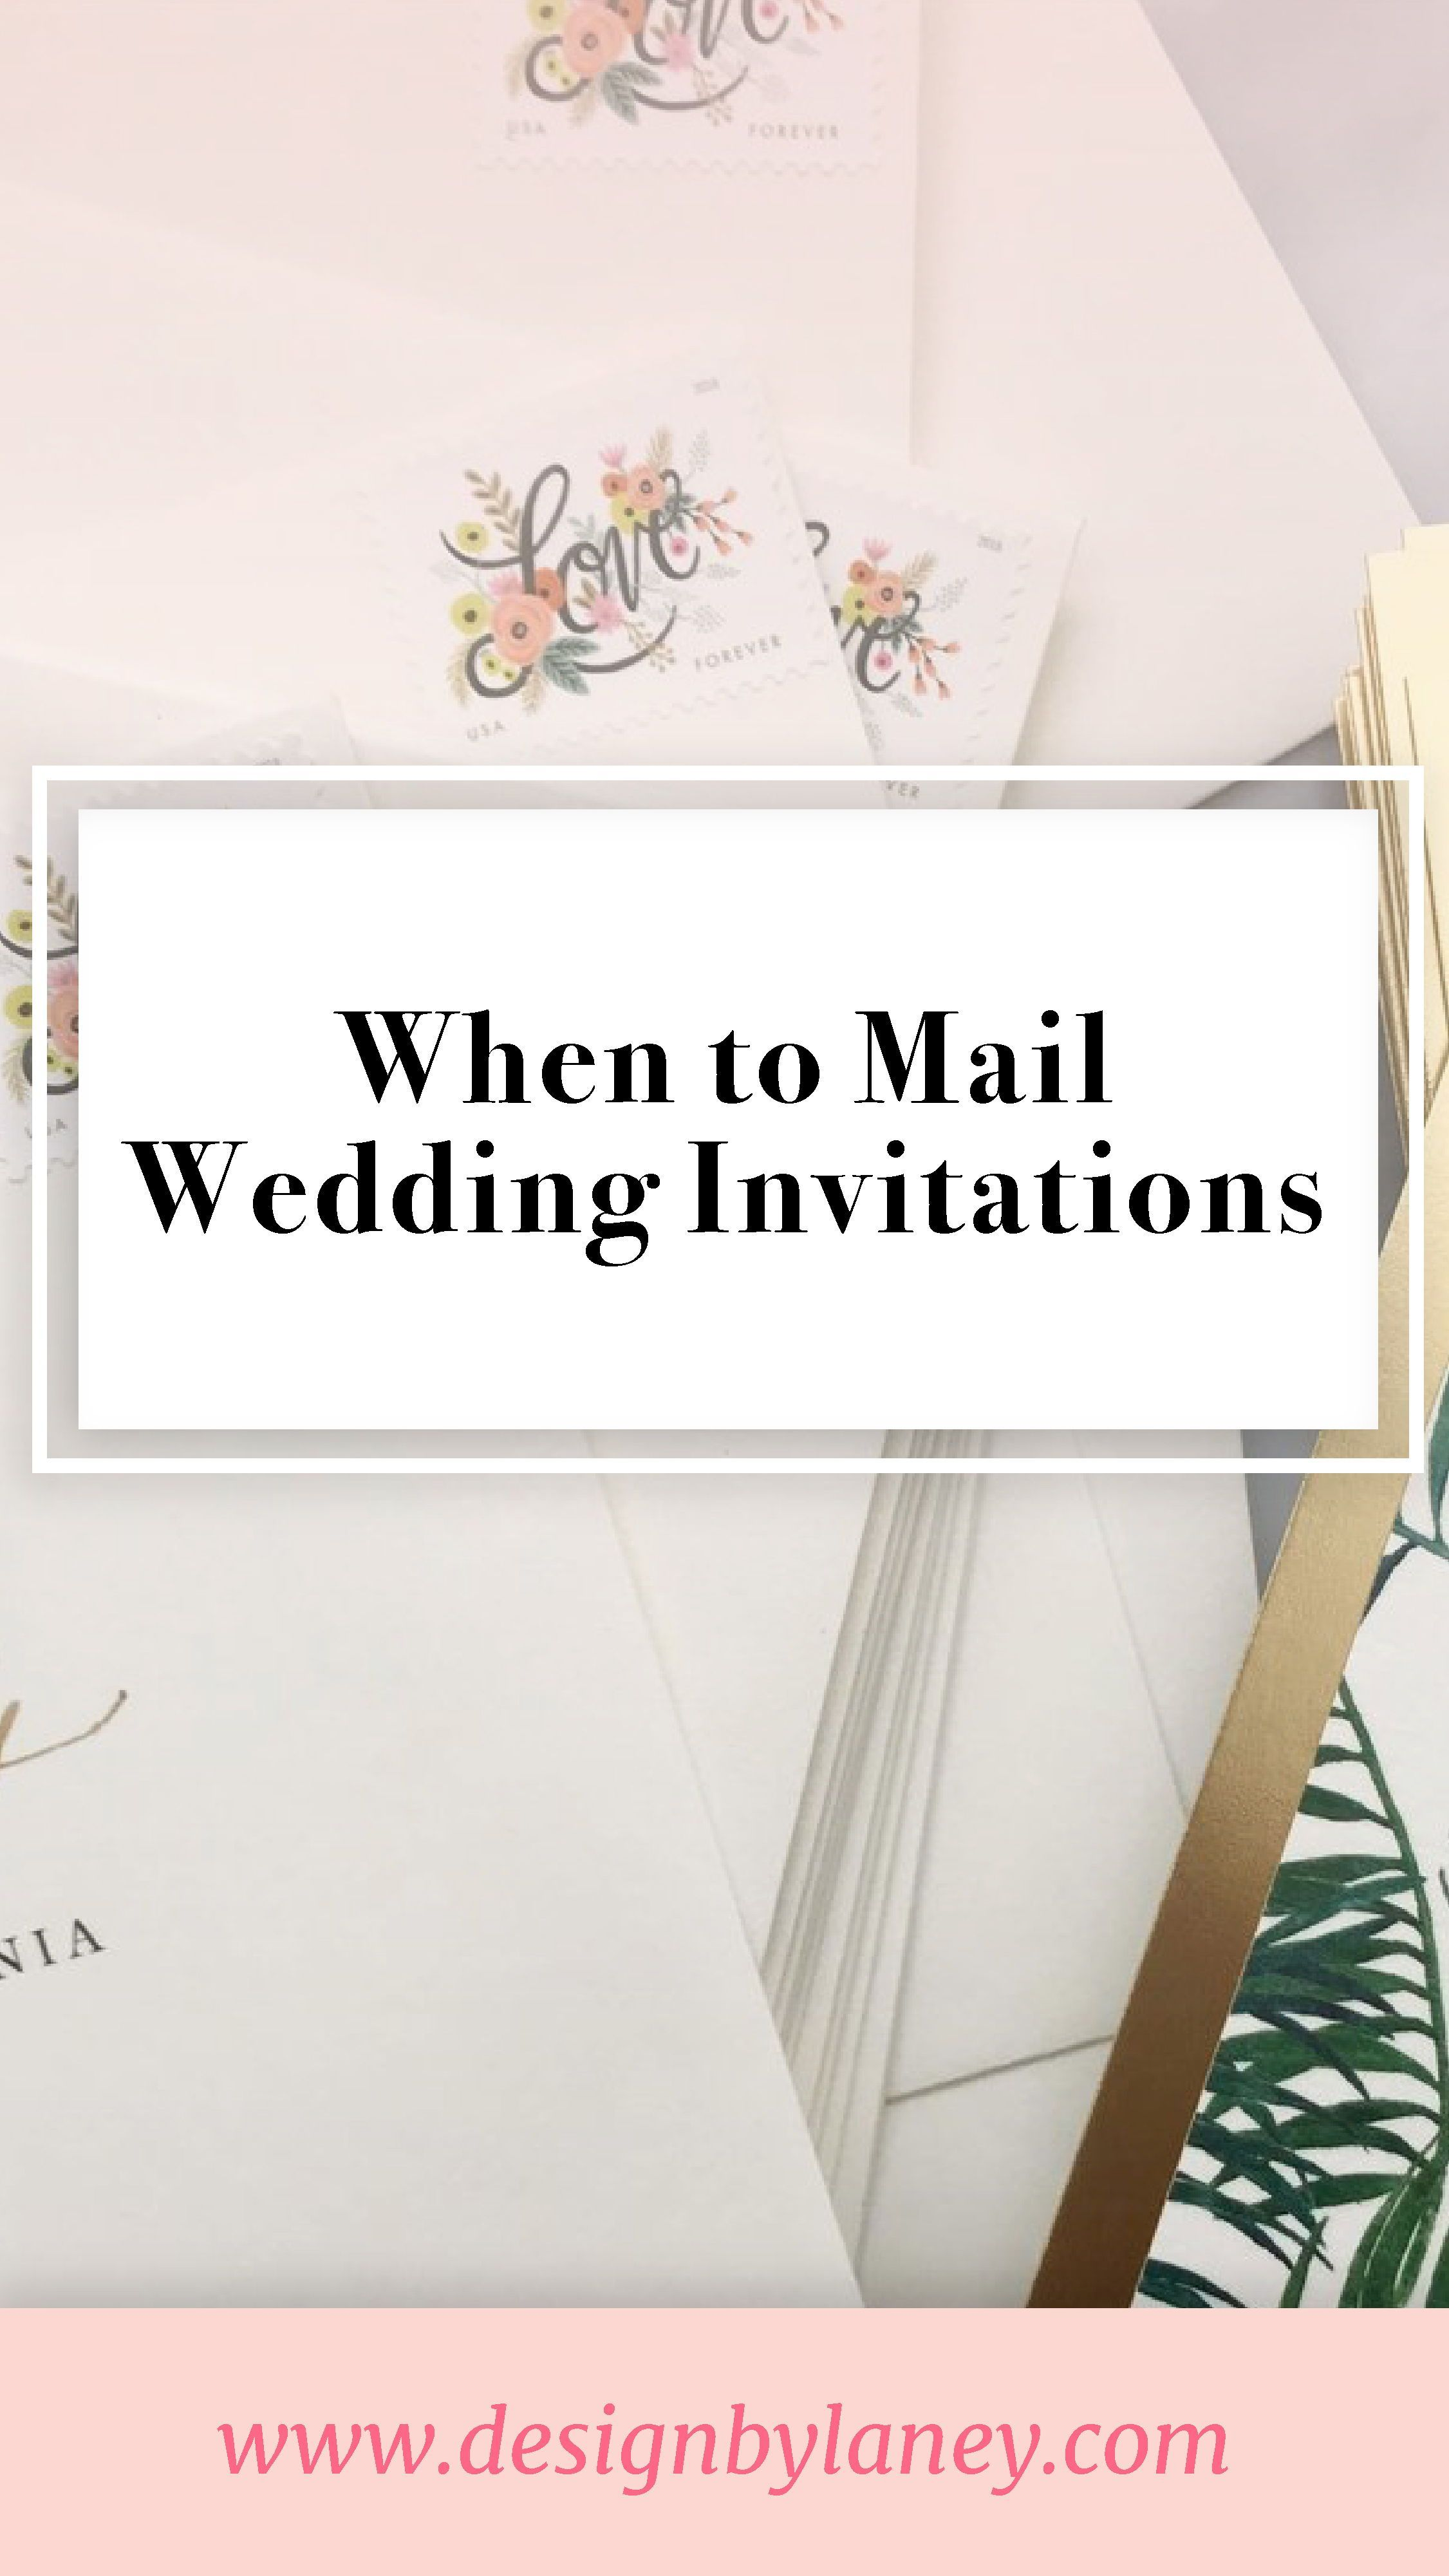 When To Mail Wedding Invitations Designbylaney Com Mail Wedding Invitations Wedding Invitations Wedding Invitation Etiquette